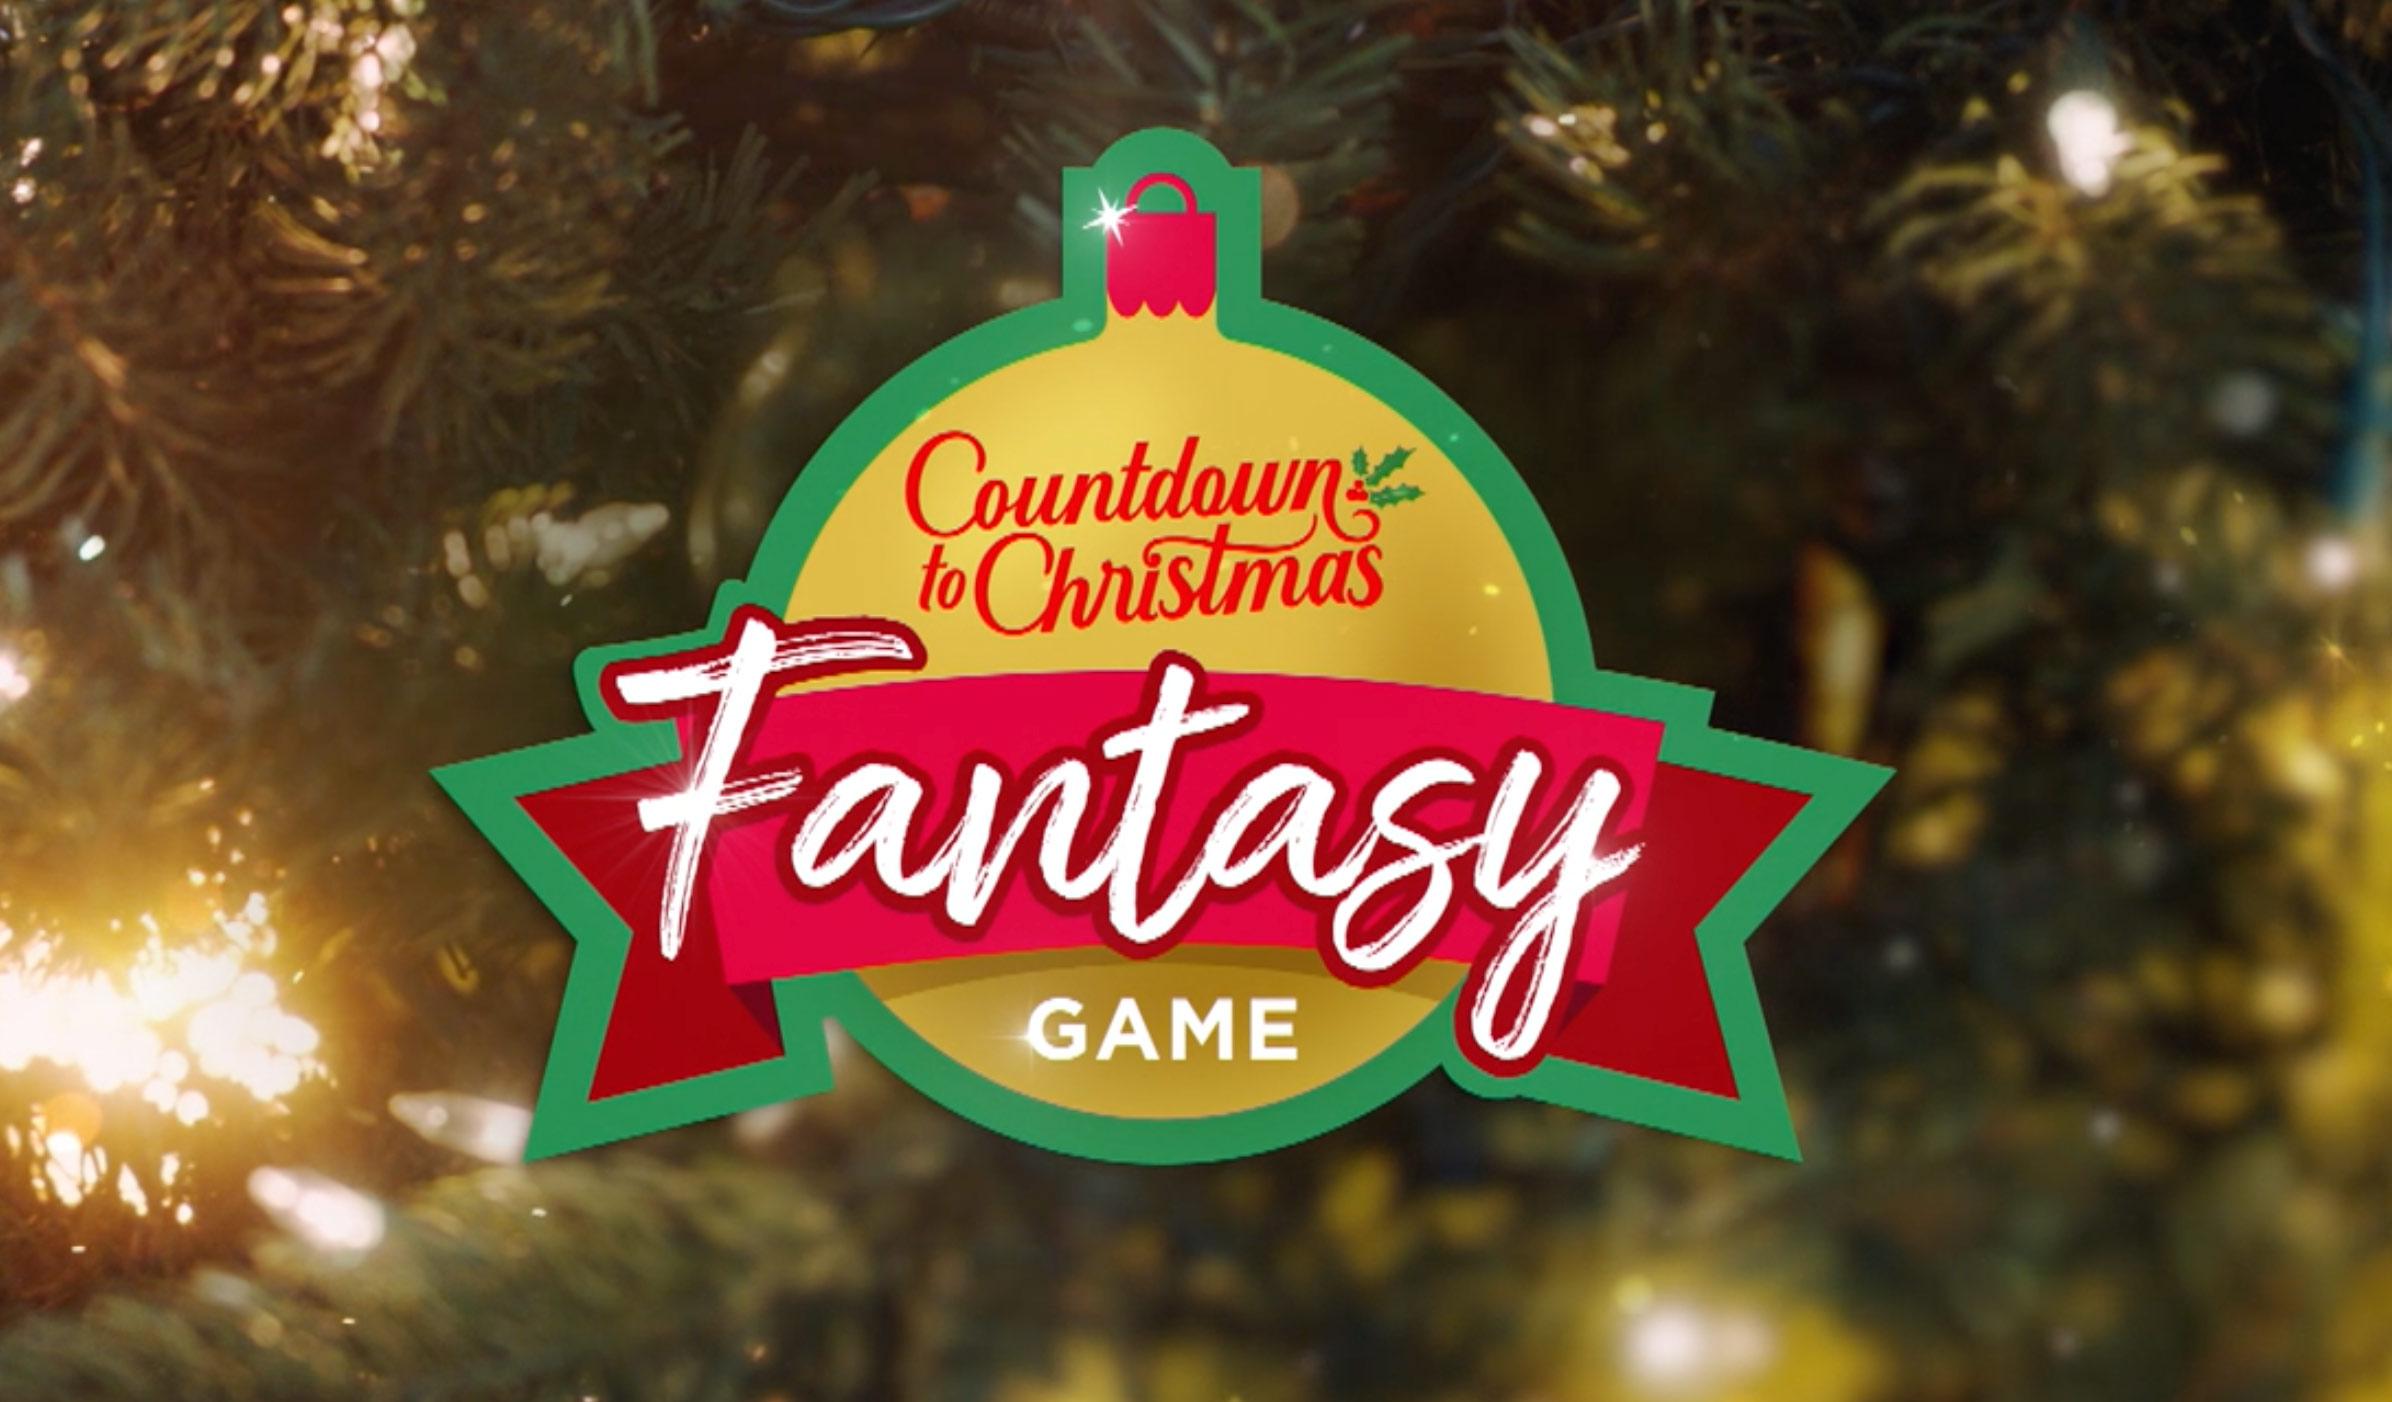 Countdown To Christmas Fantasy